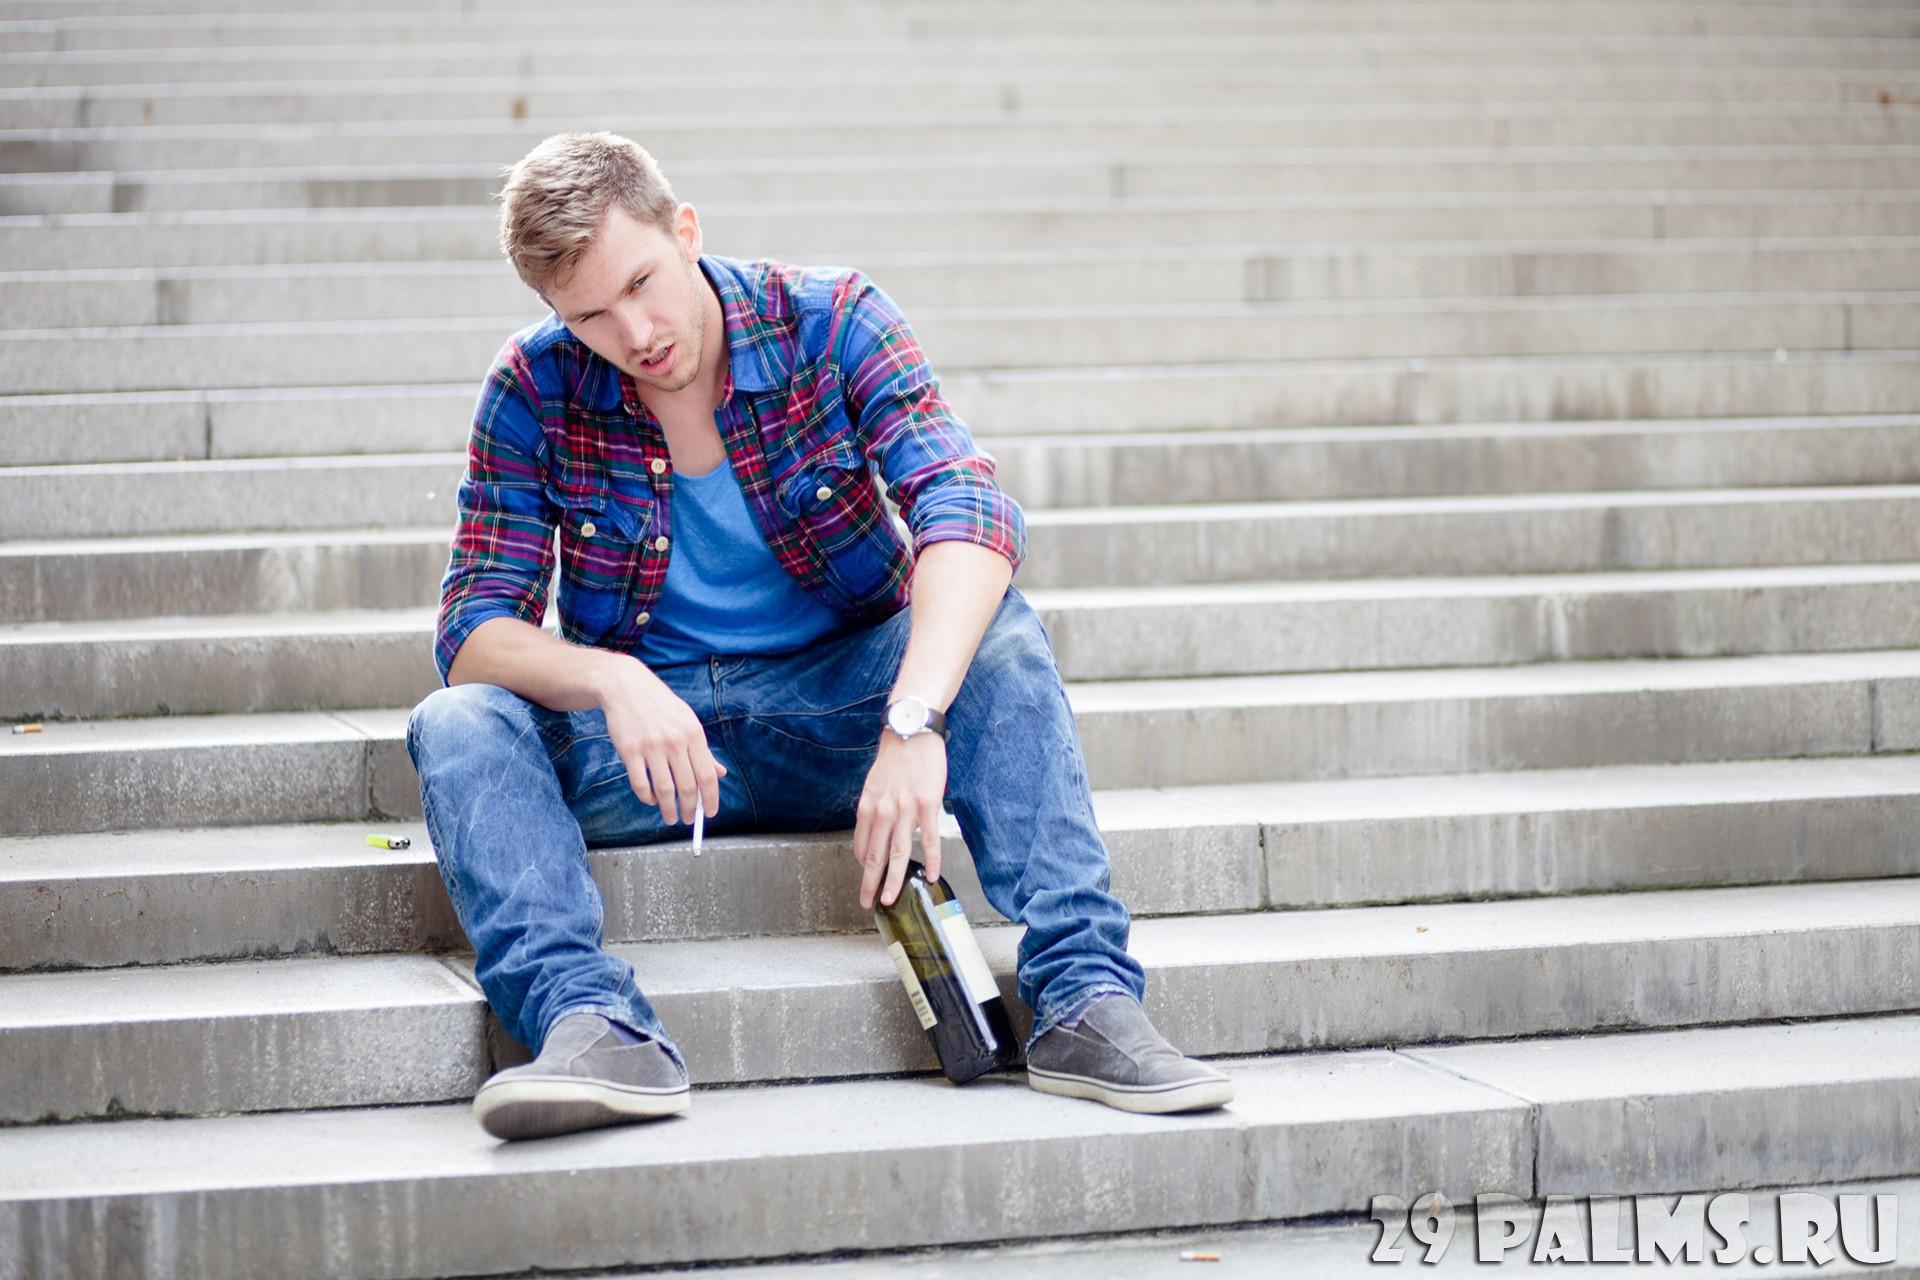 Фото мужчины на лестнице 3 фотография